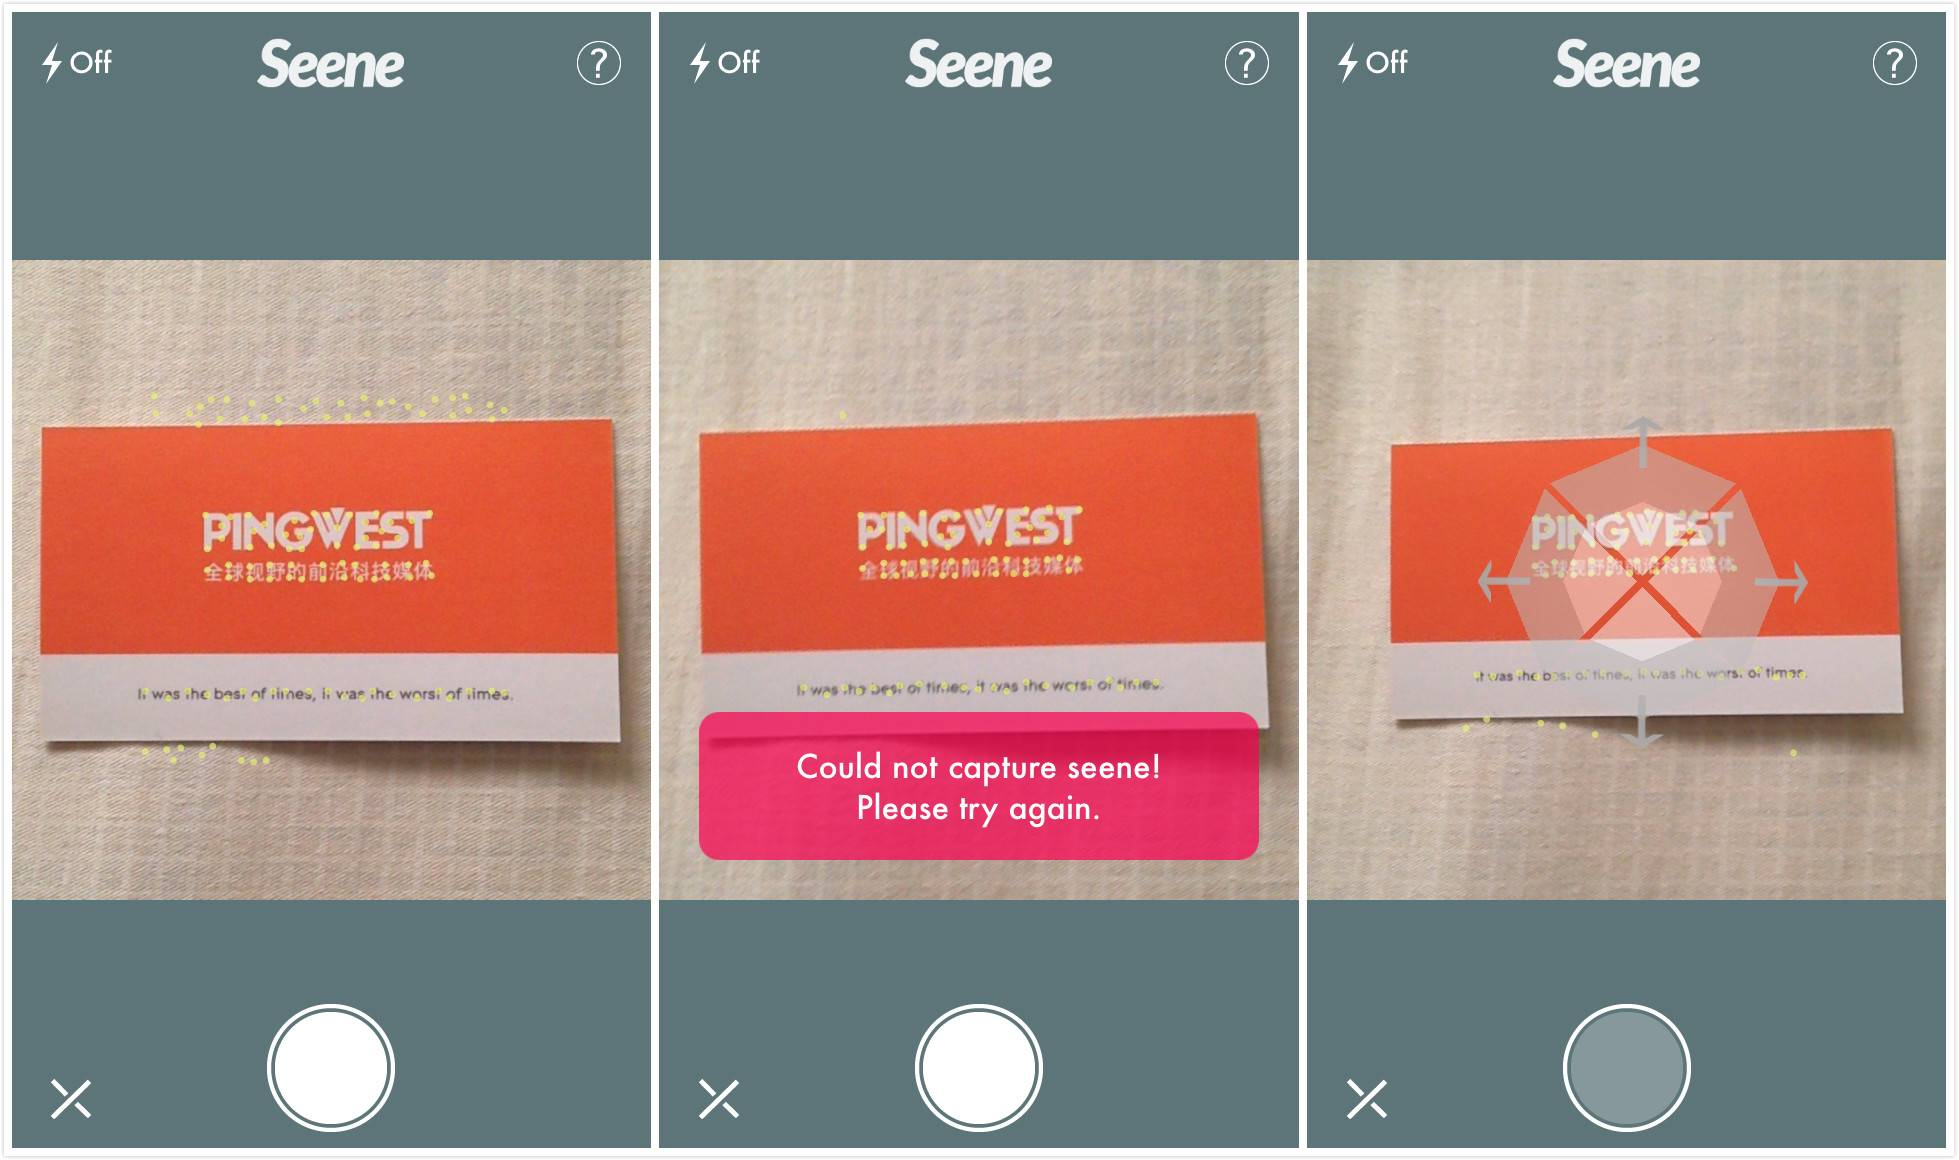 app-seene-2